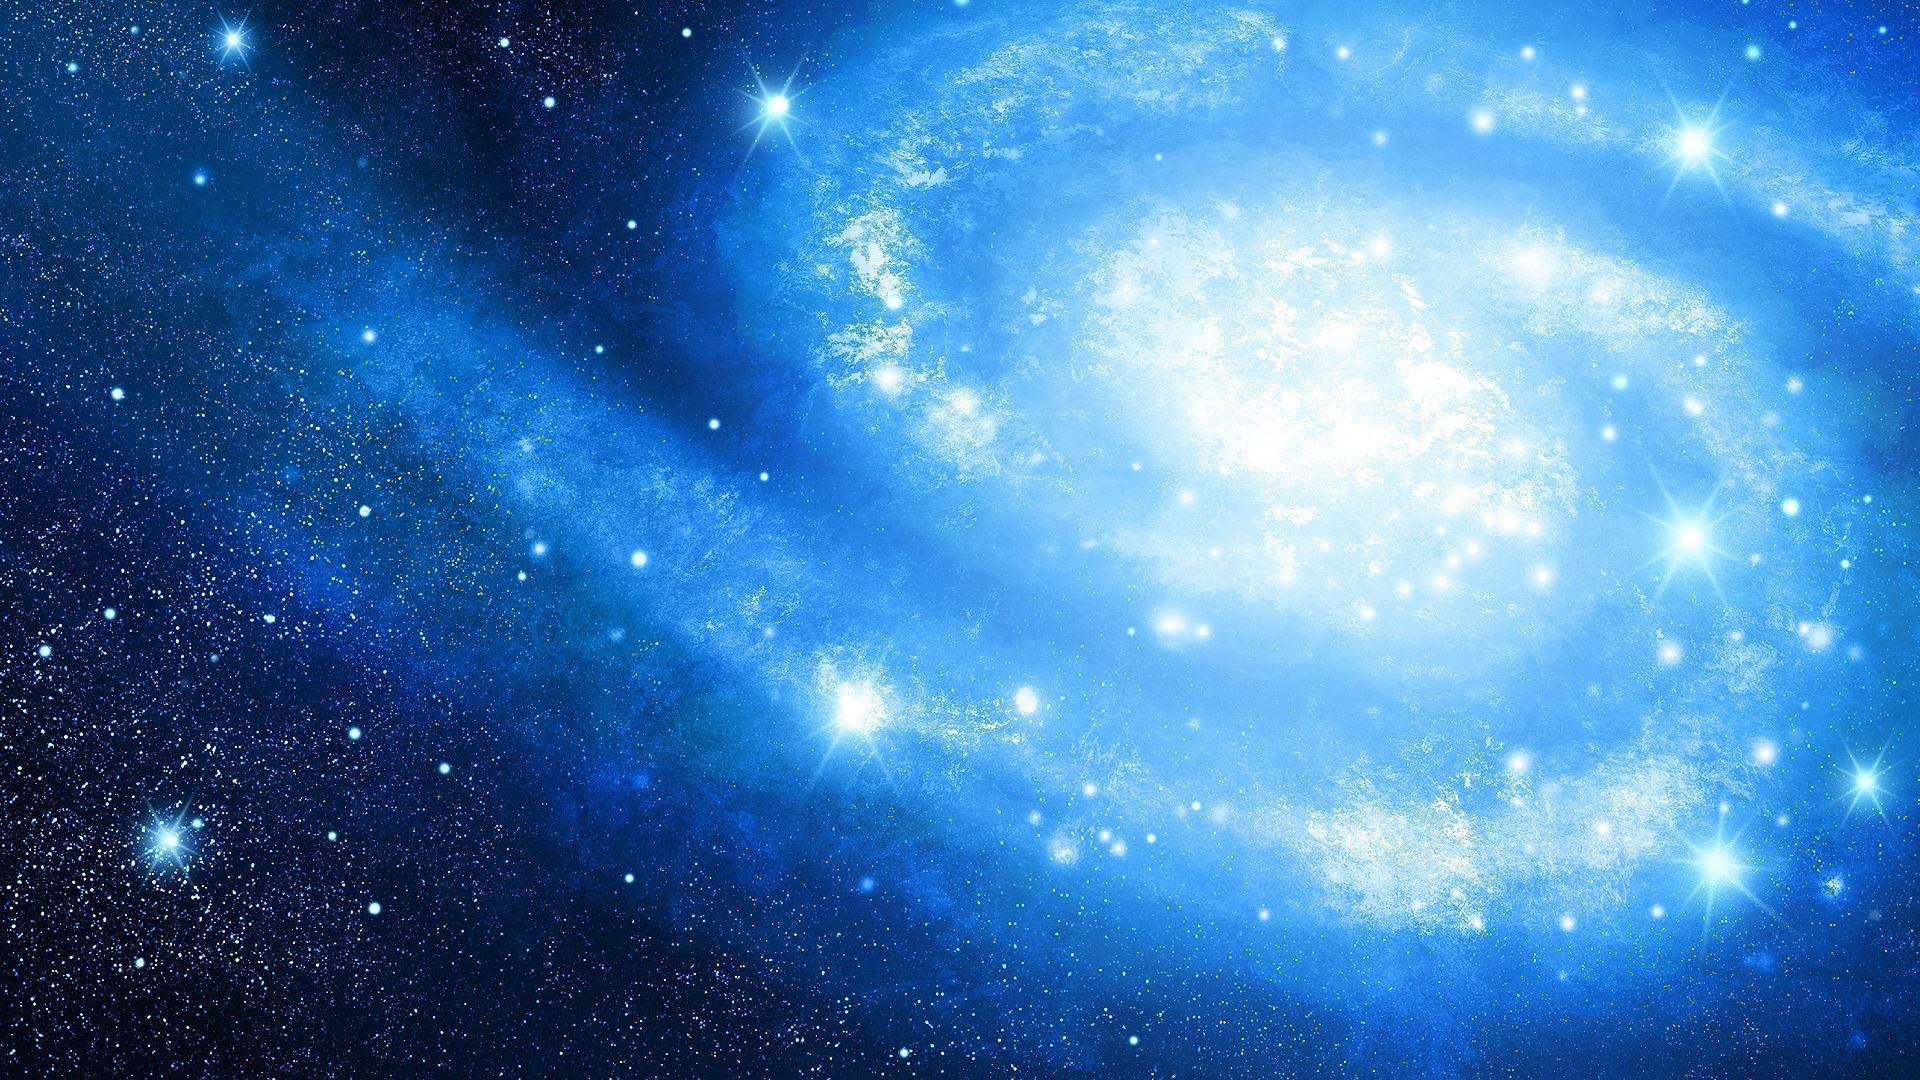 10 Latest Blue Galaxy Wallpaper 1920x1080 Full Hd 1920 1080 For Pc